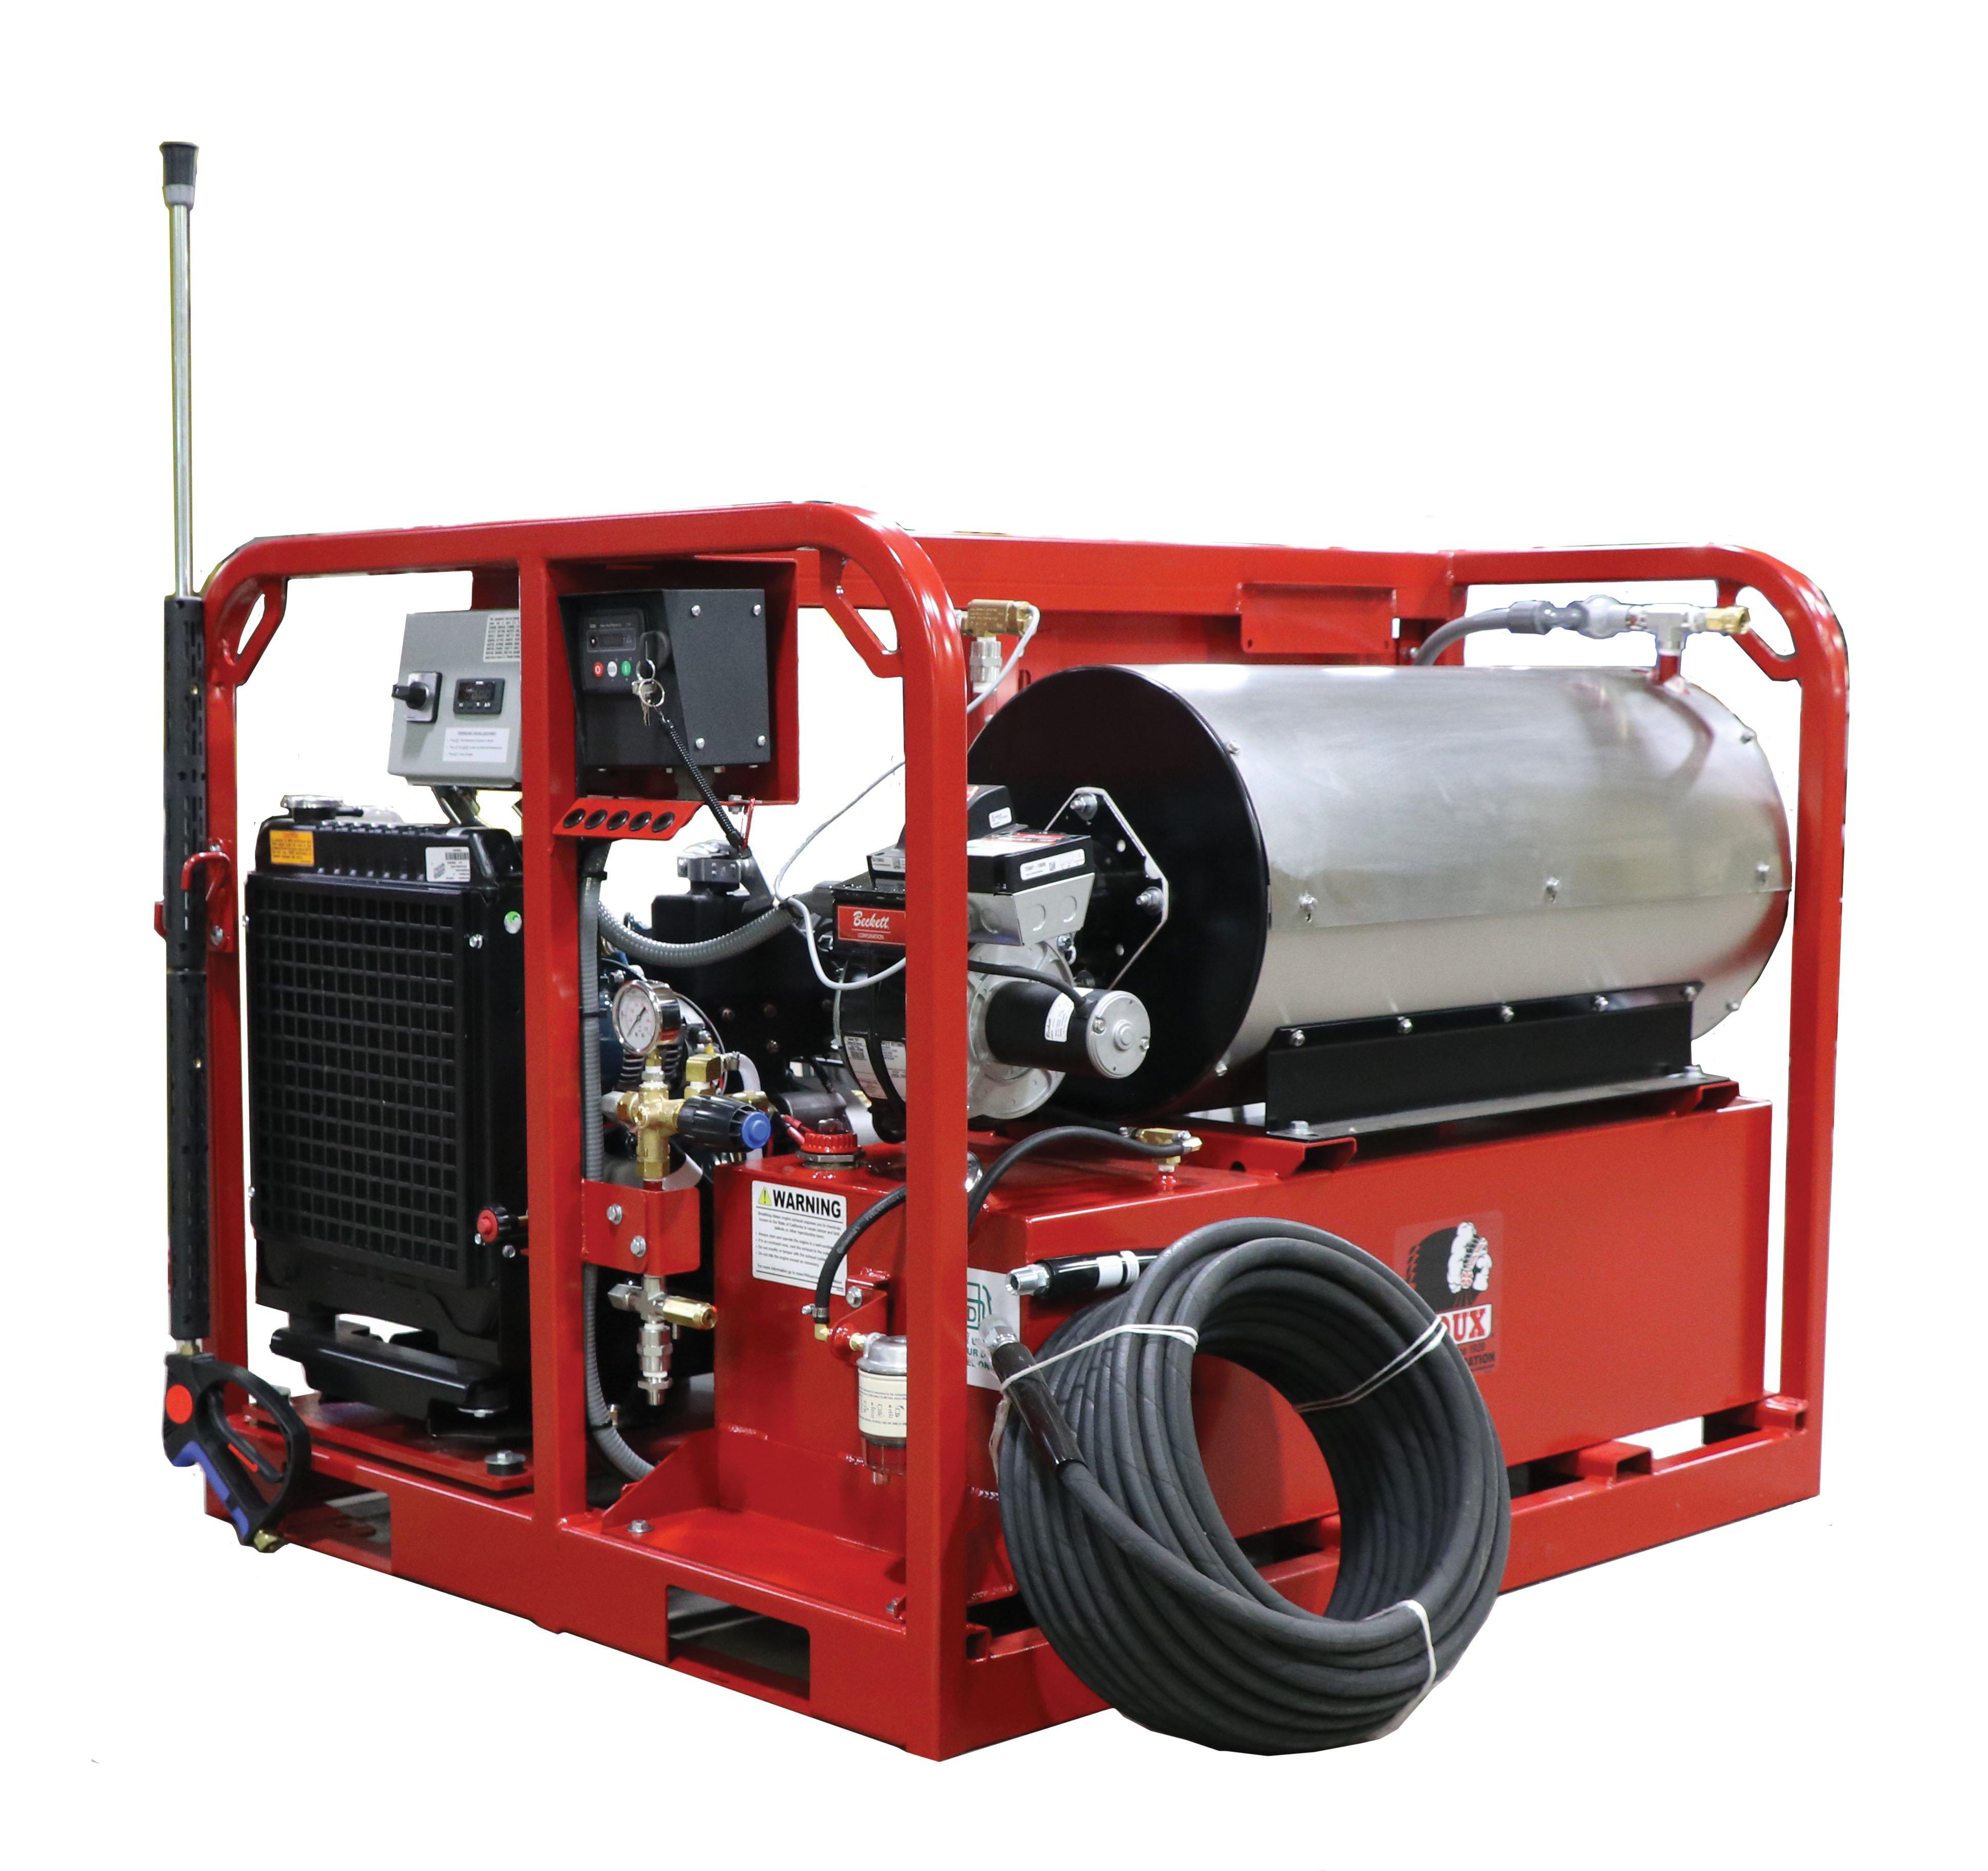 H5.5D3000-D Pressure Washer